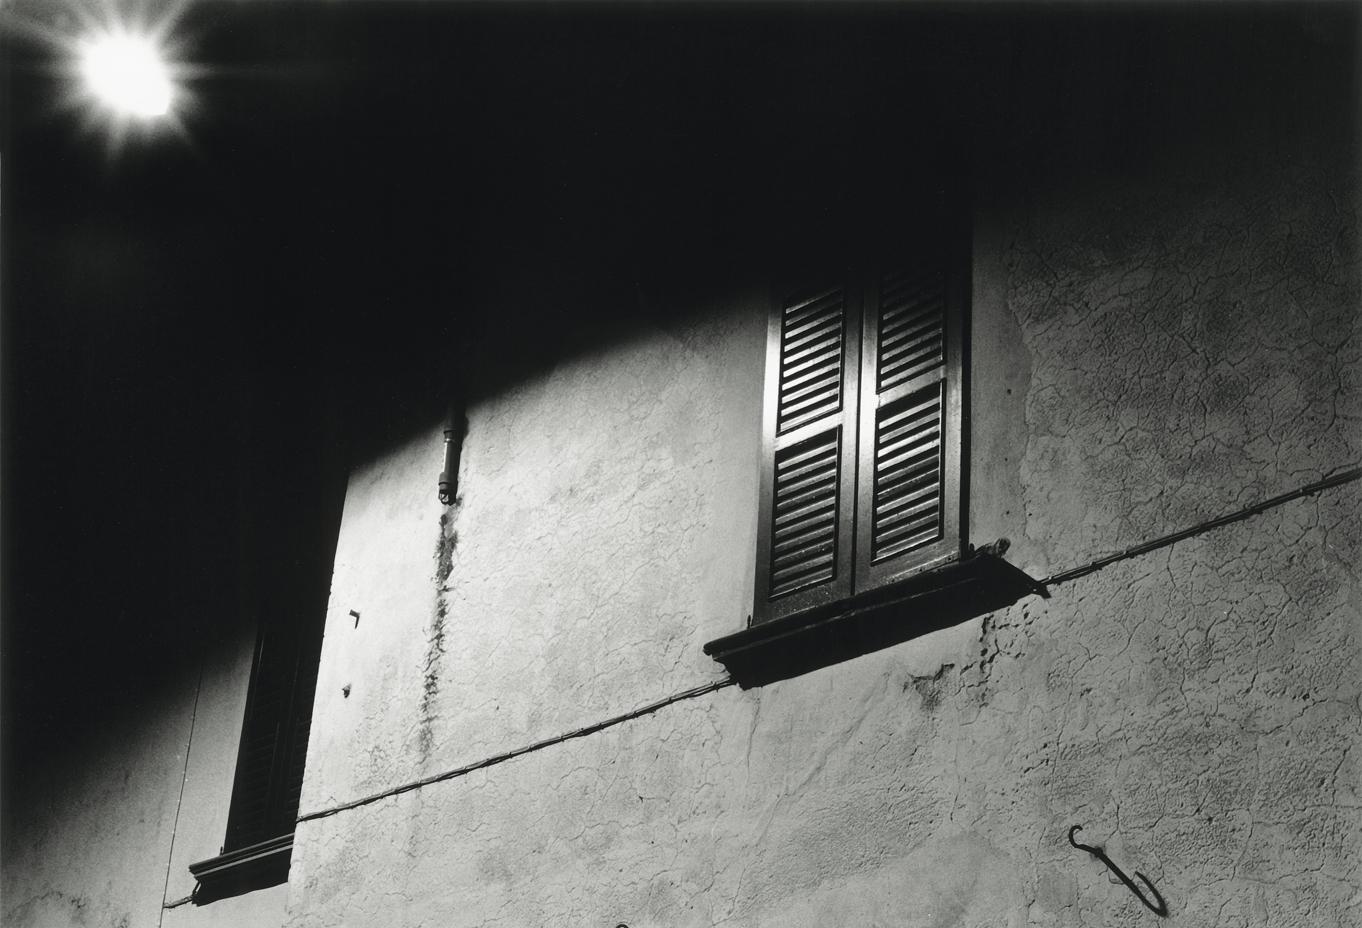 10) Study n. 2 (2011) Paolo Novelli